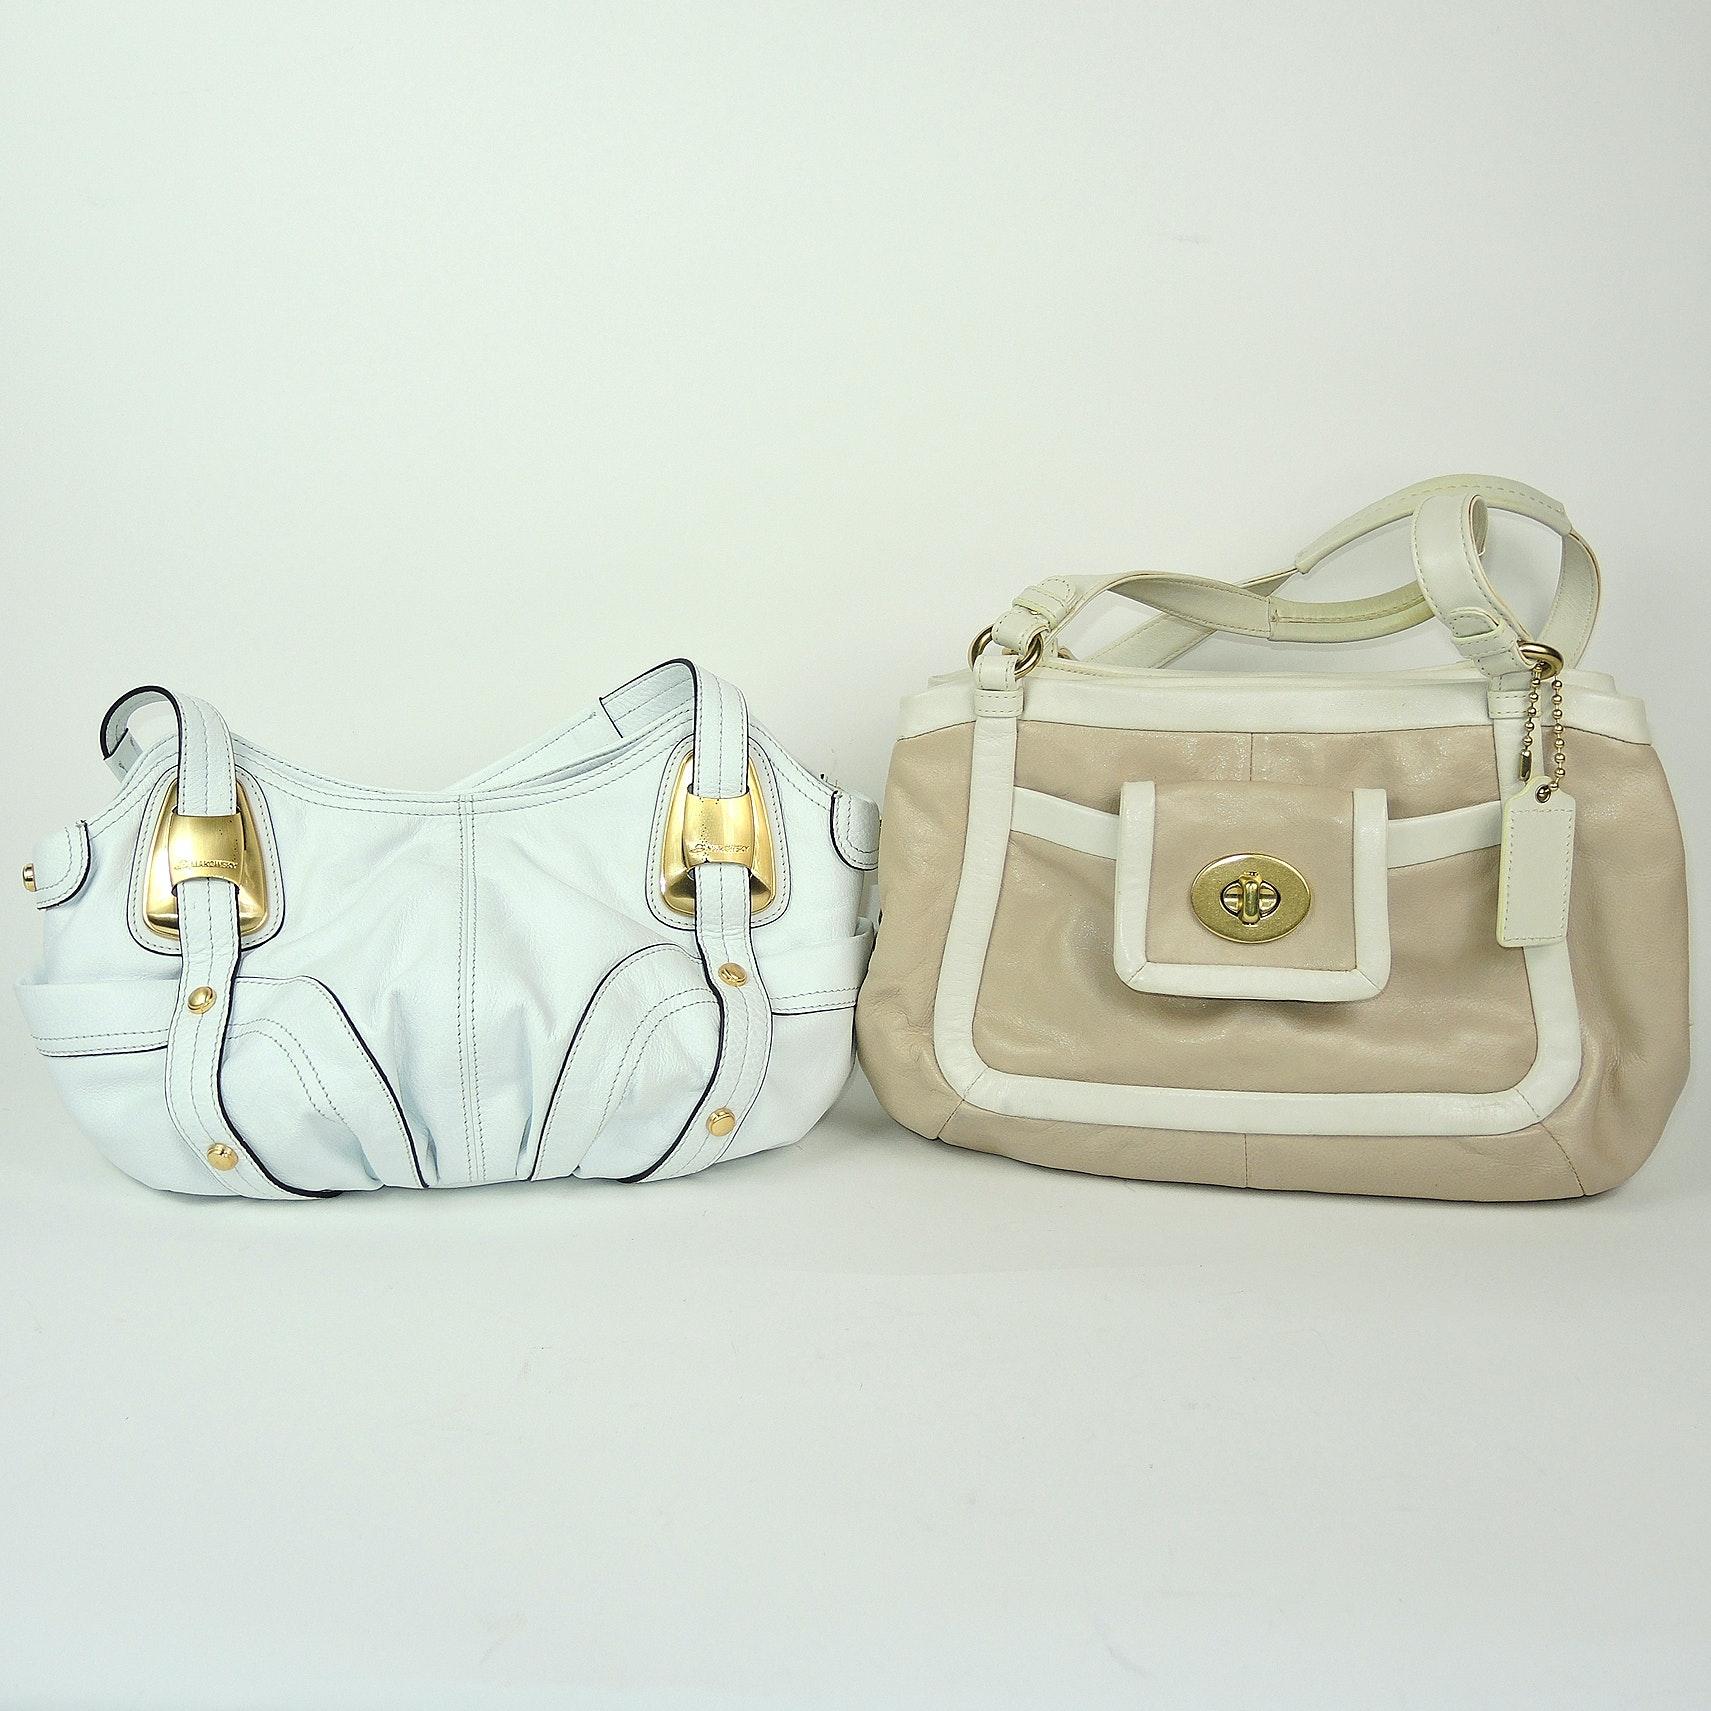 Coach Cricket Satchel and B. Makowsky White Leather Shoulder Bag